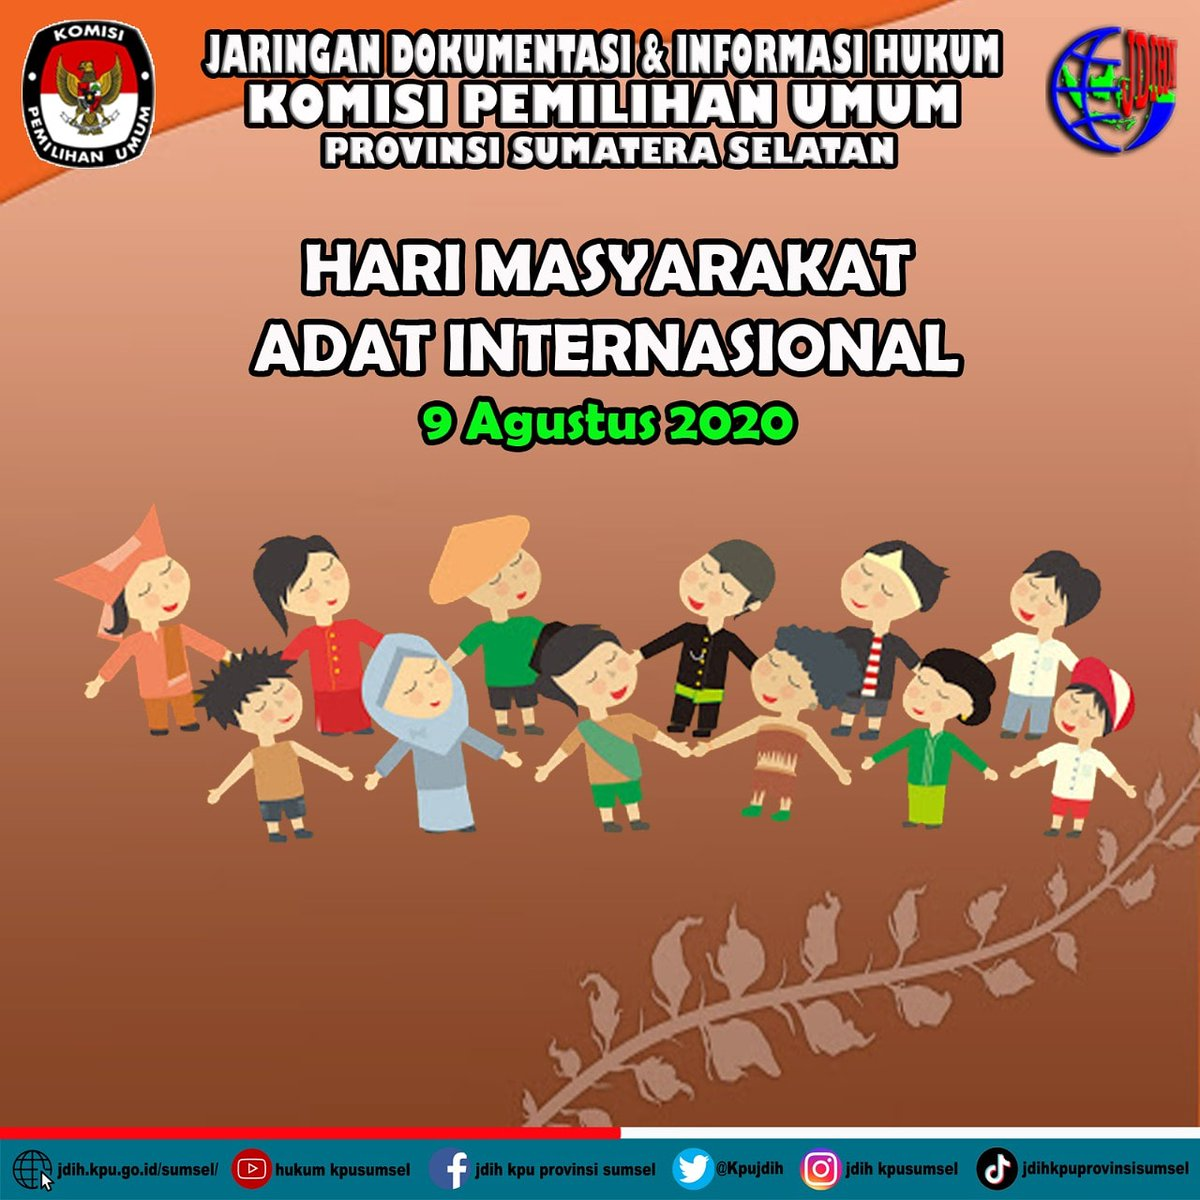 Pada 9 Agustus setiap tahunnya adalah Hari masyarakat adat internasional, Indonesia dengan beragam kekayaan kultur dan etnik yang ada, mari bersama menghormati dan melindungi hak-hak mereka. pic.twitter.com/RayIPesuen